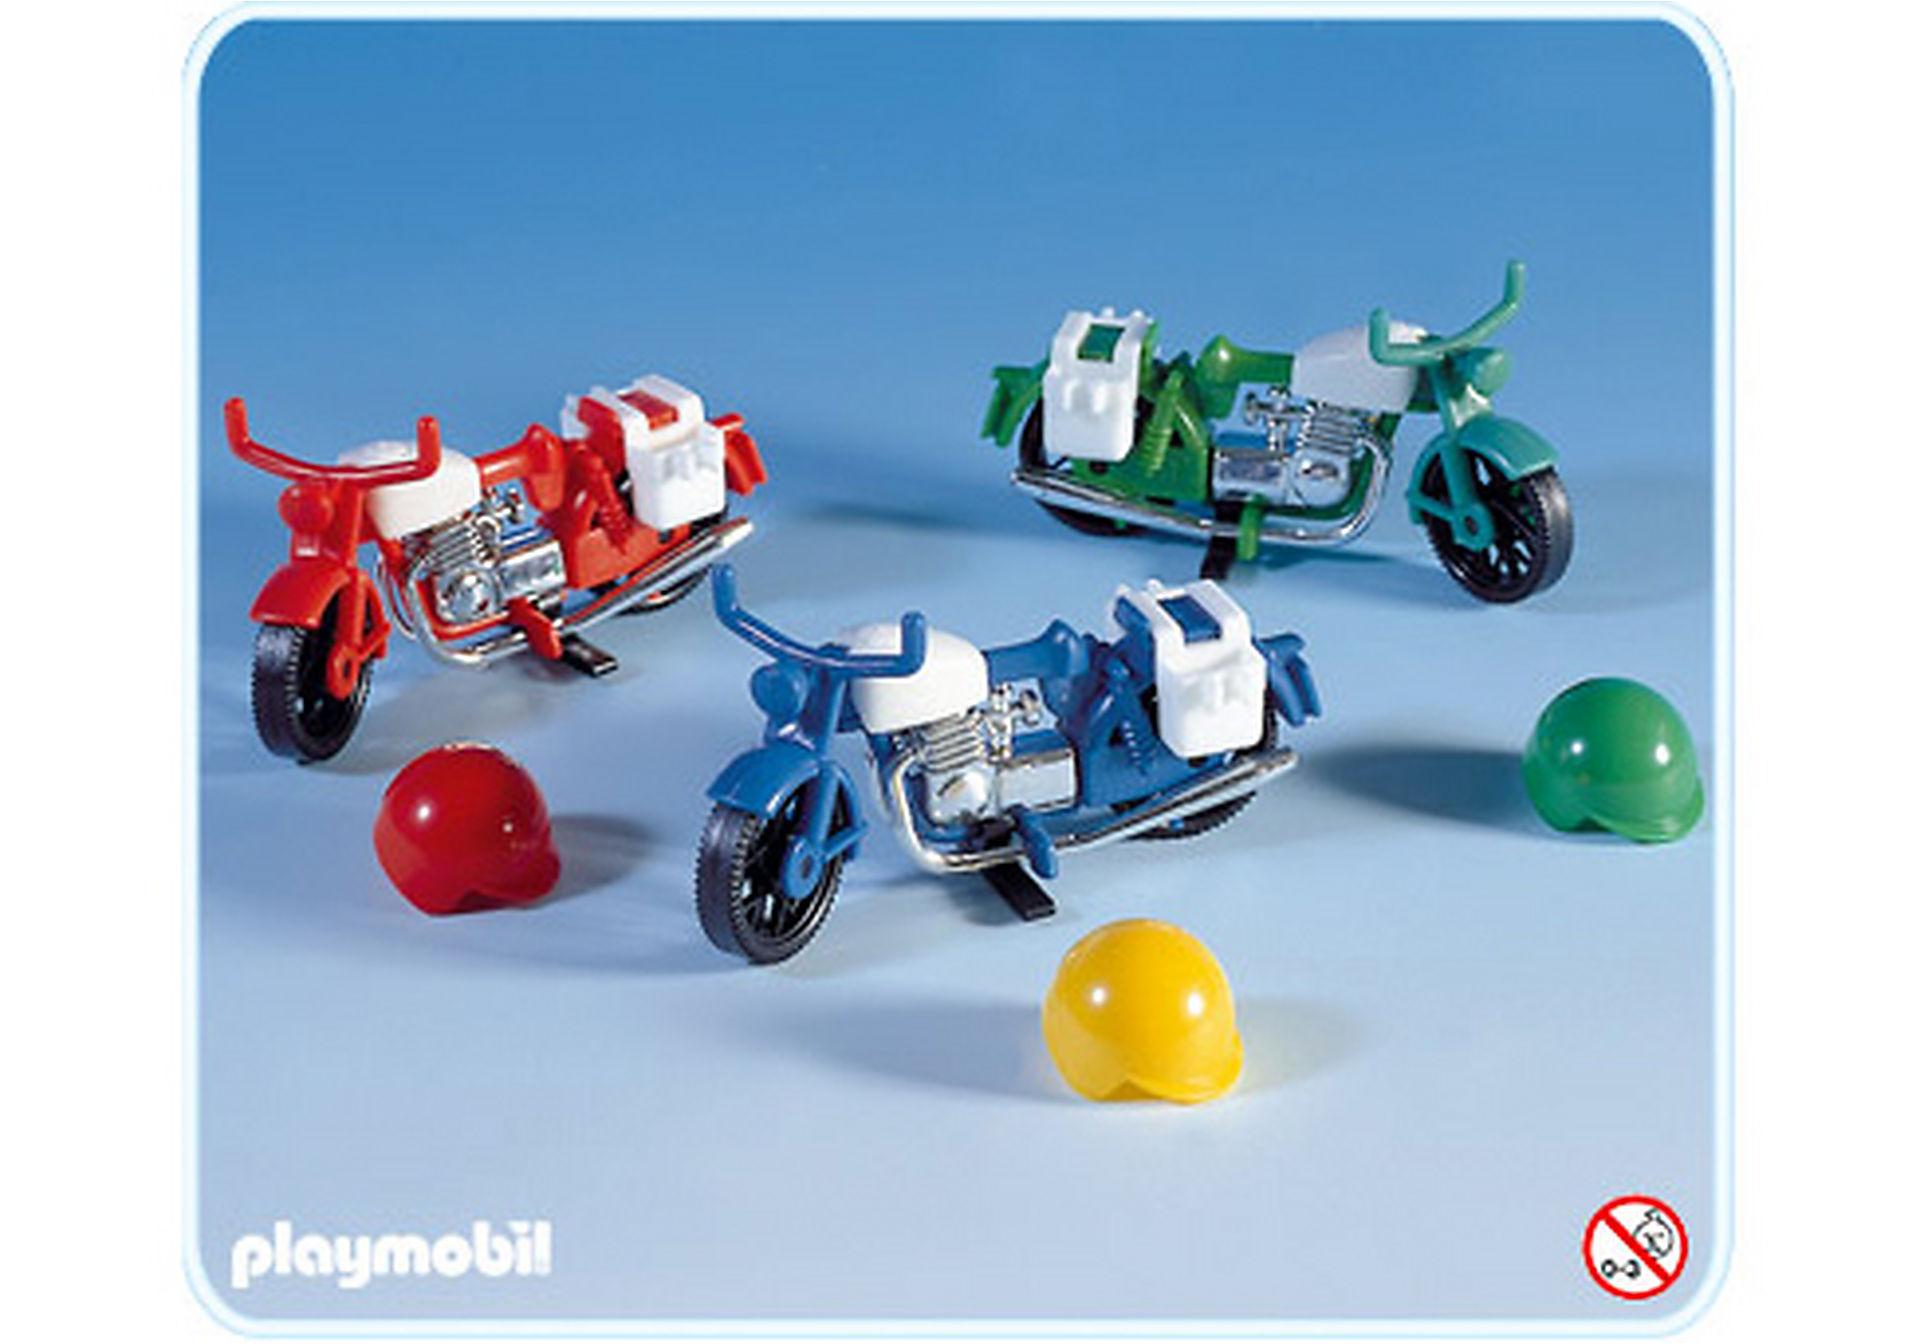 http://media.playmobil.com/i/playmobil/3208-A_product_detail/Motocyclettes